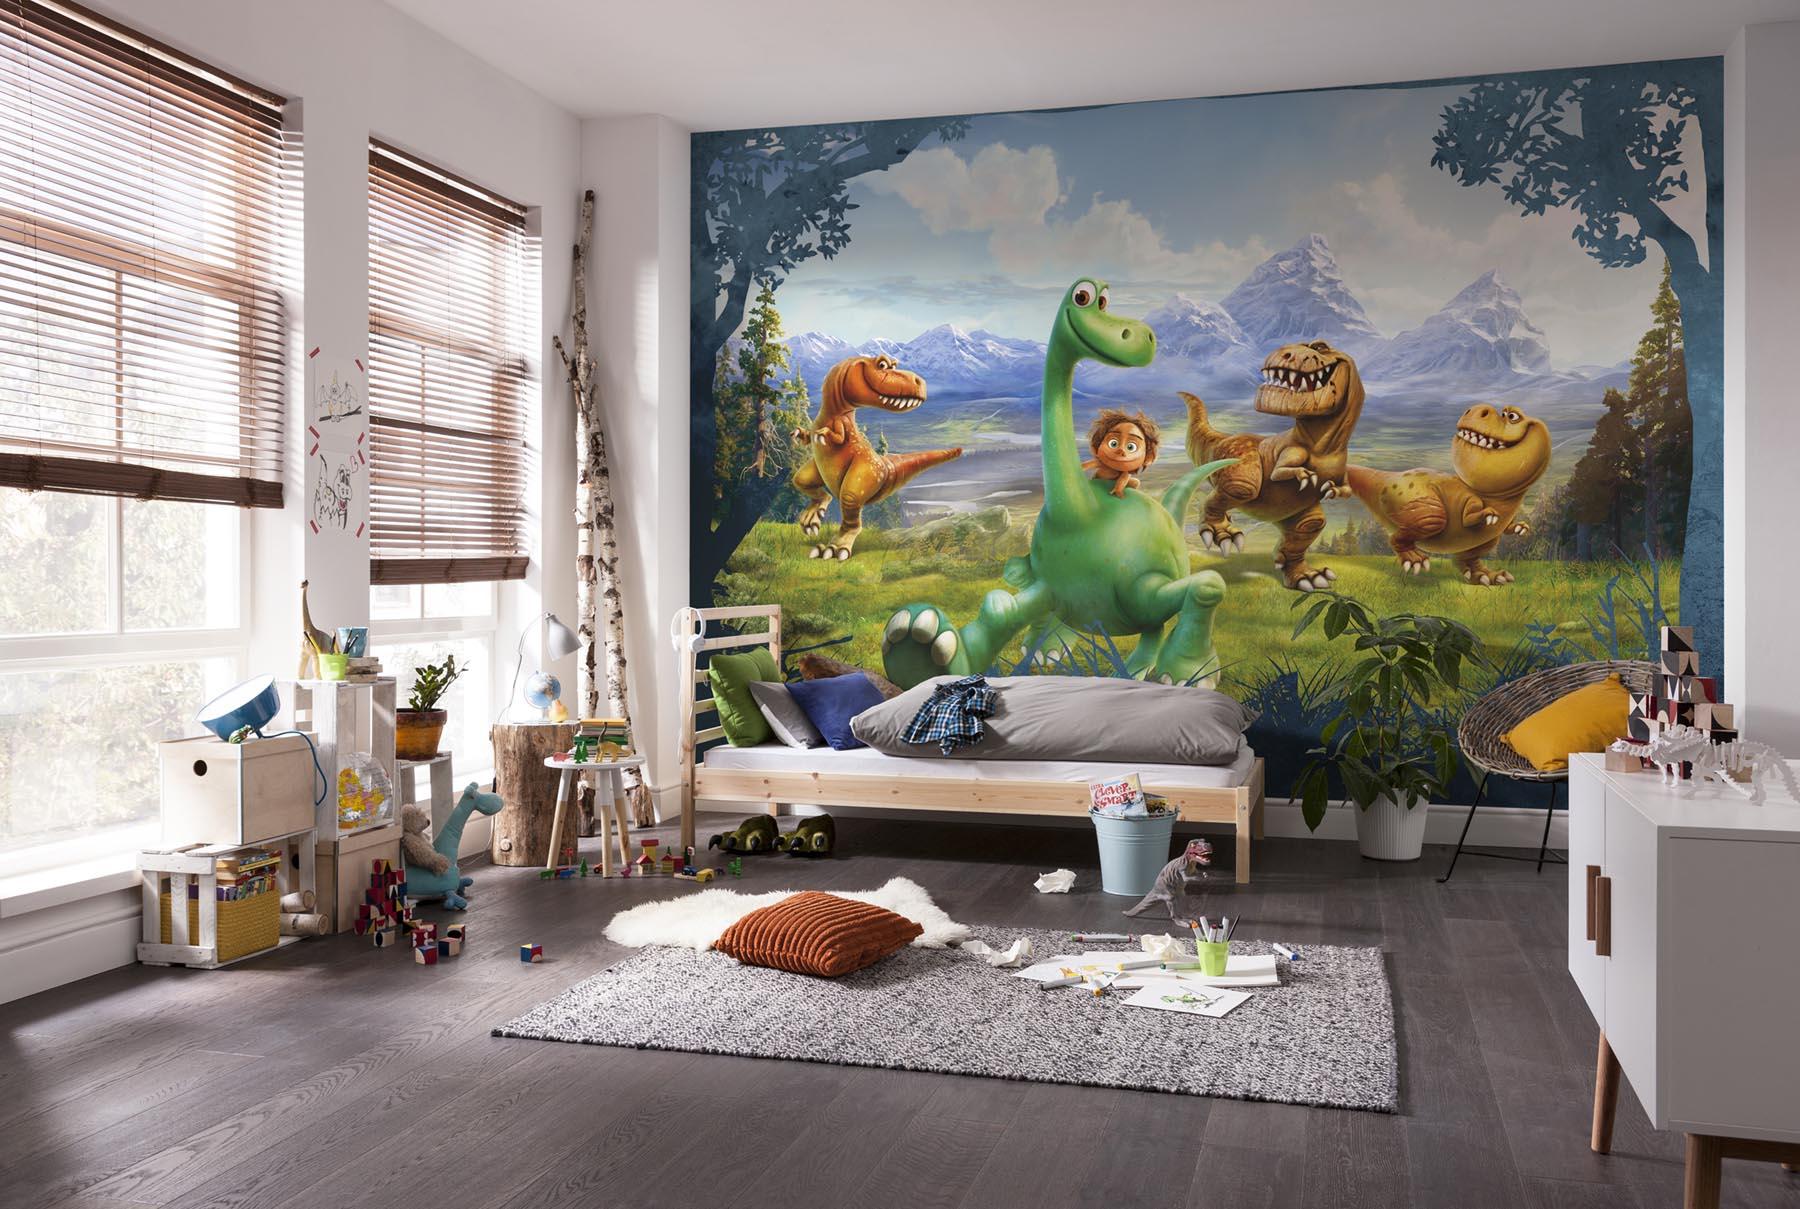 kiss fototapeten zu besten preisen fototapete bildtapete dinosaurier 368 x 254 cm disney. Black Bedroom Furniture Sets. Home Design Ideas